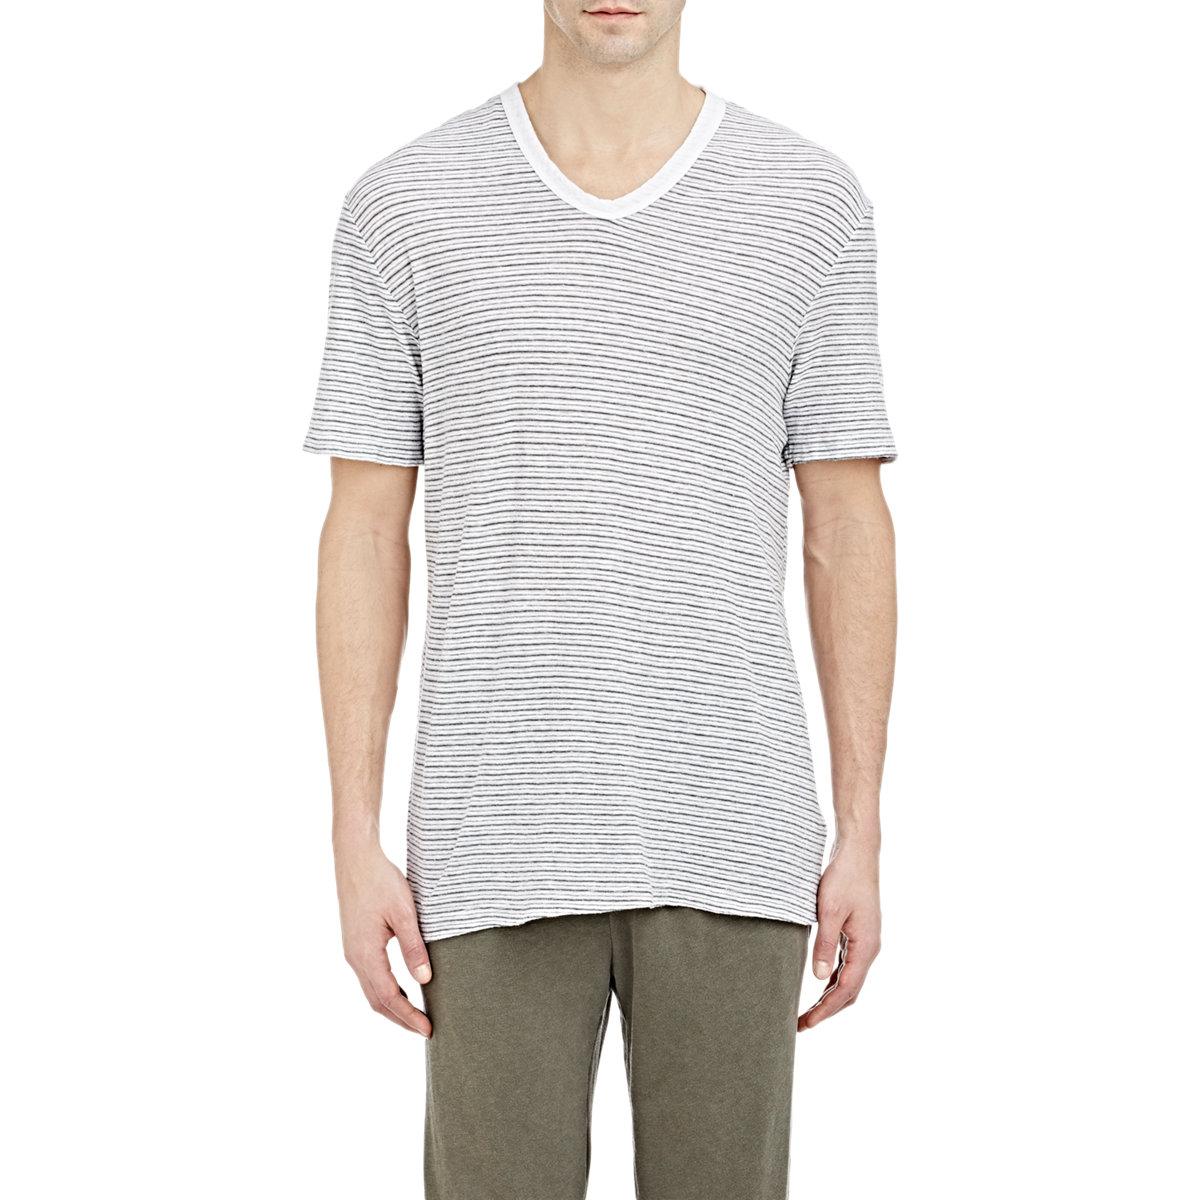 James perse slub t shirt in gray for men white lyst for What is a slub shirt